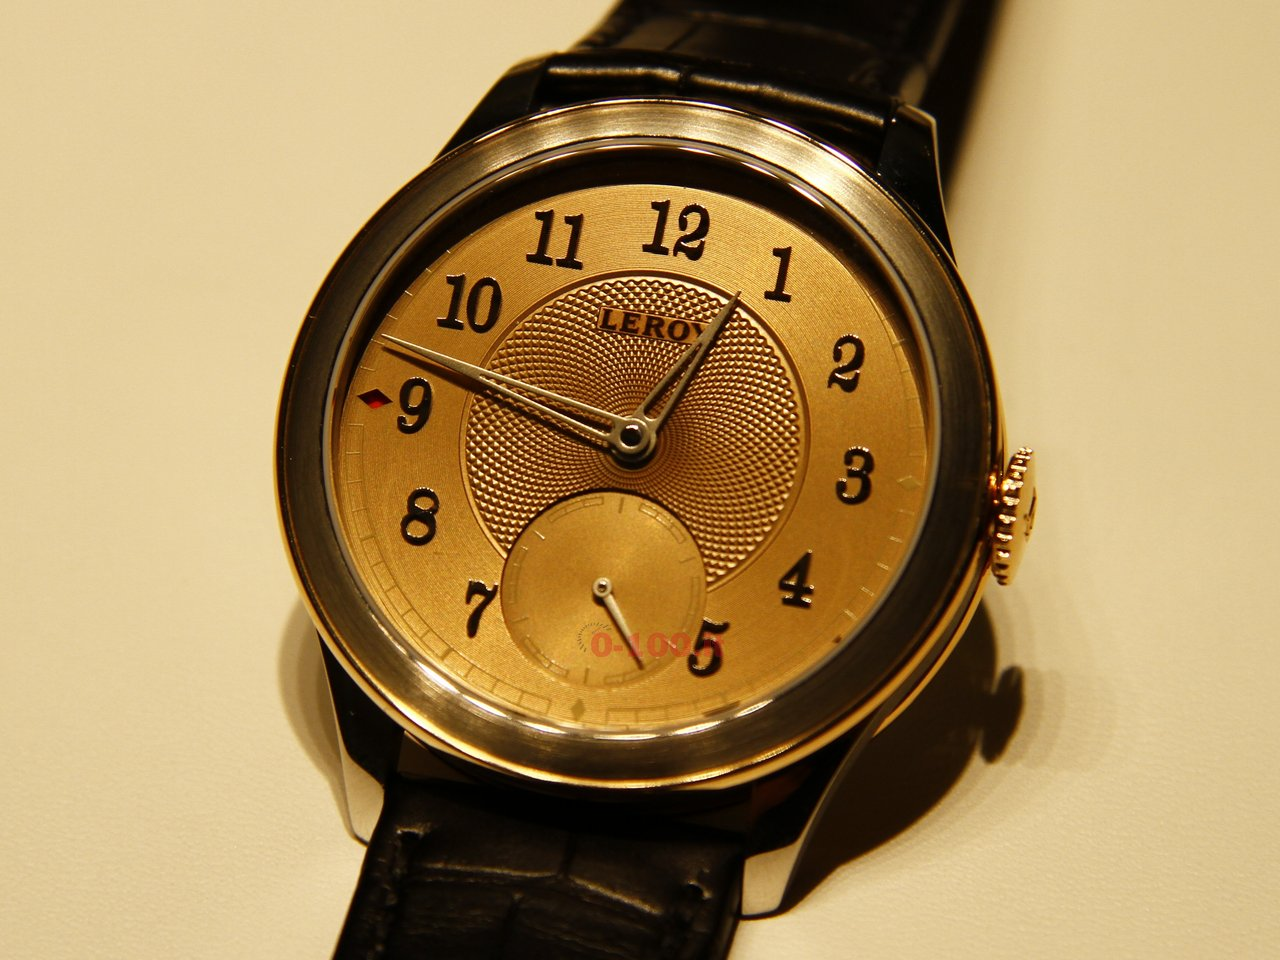 baselworld-2015_leroy-chronometer-l200-0-100-10